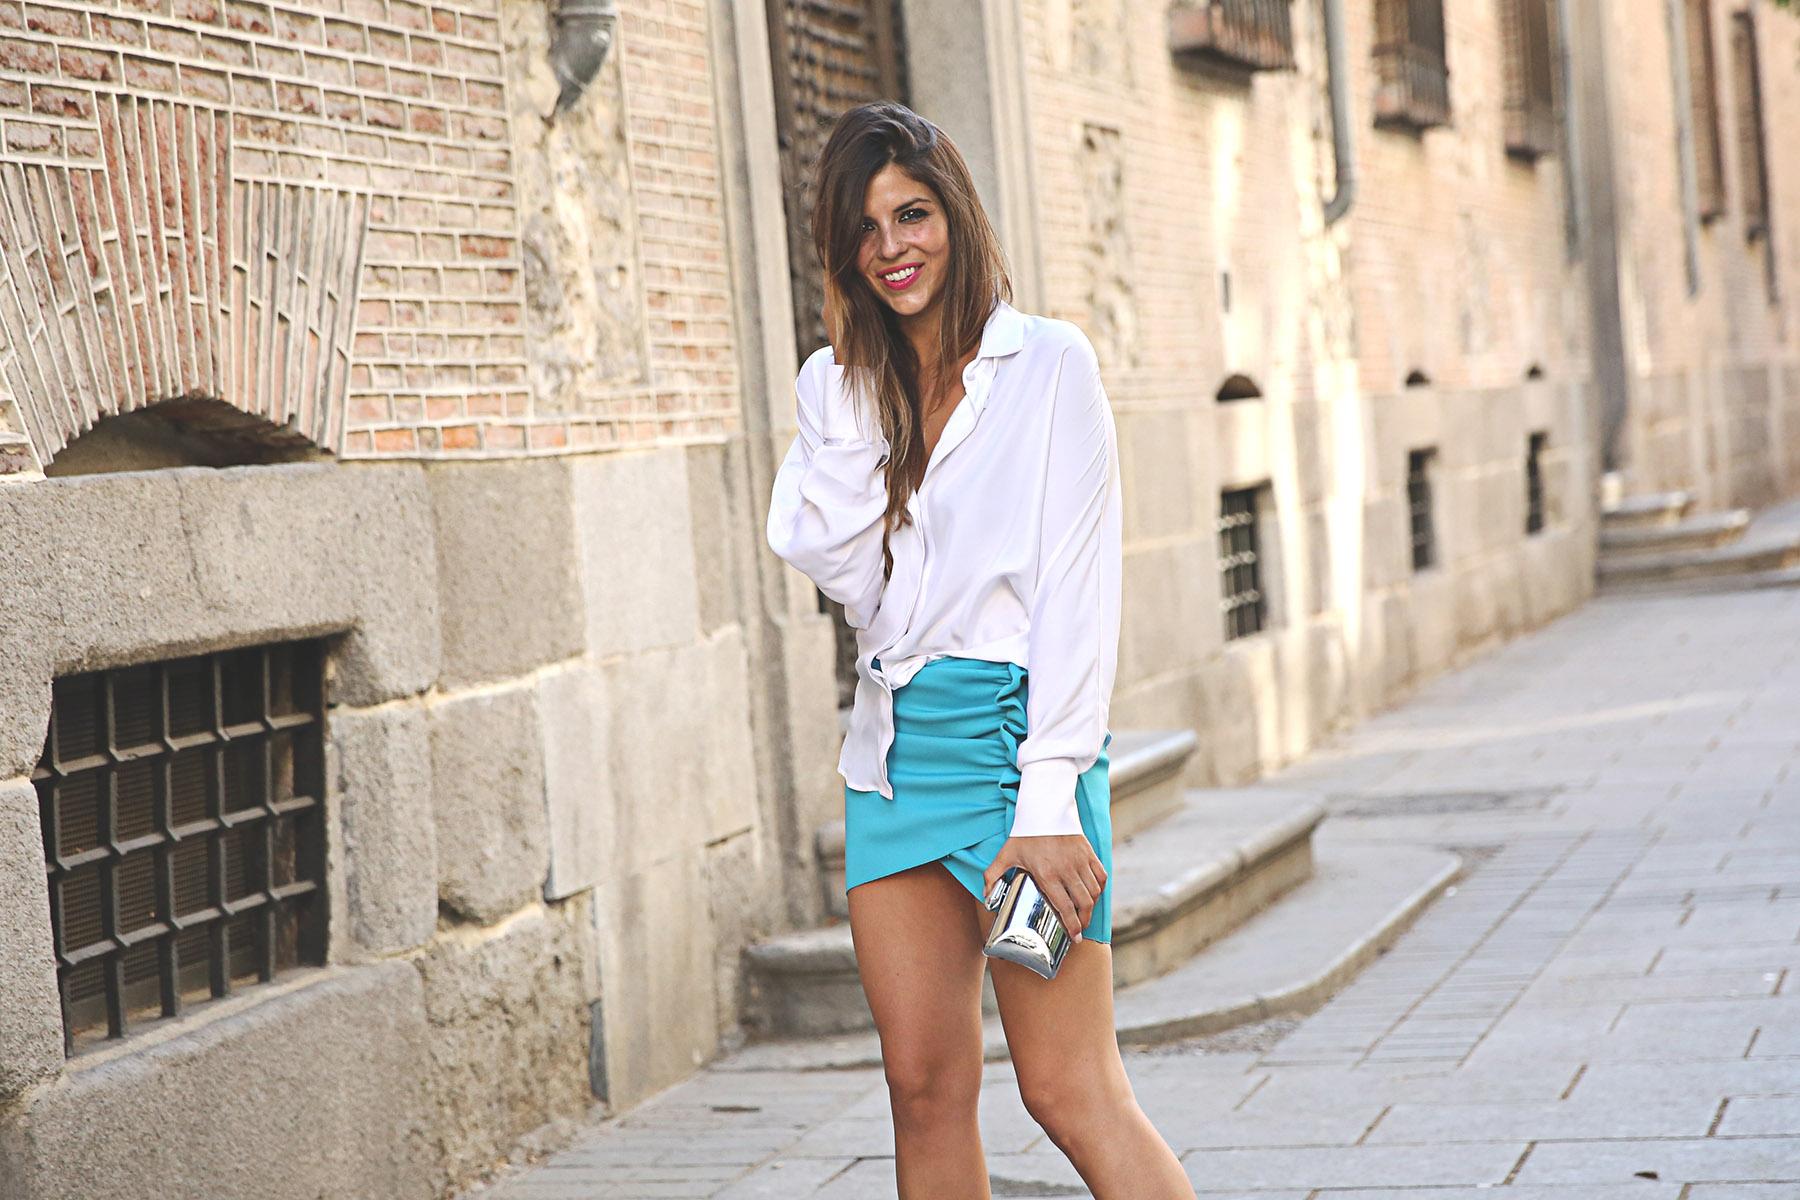 trendy-taste-look-outfit-street-style-ootd-blog-blogger-fashion-spain-moda-españa-lolali-blue-neopreno-azul-falda-blusa-bcbg-338-sandalias-serpiente-3